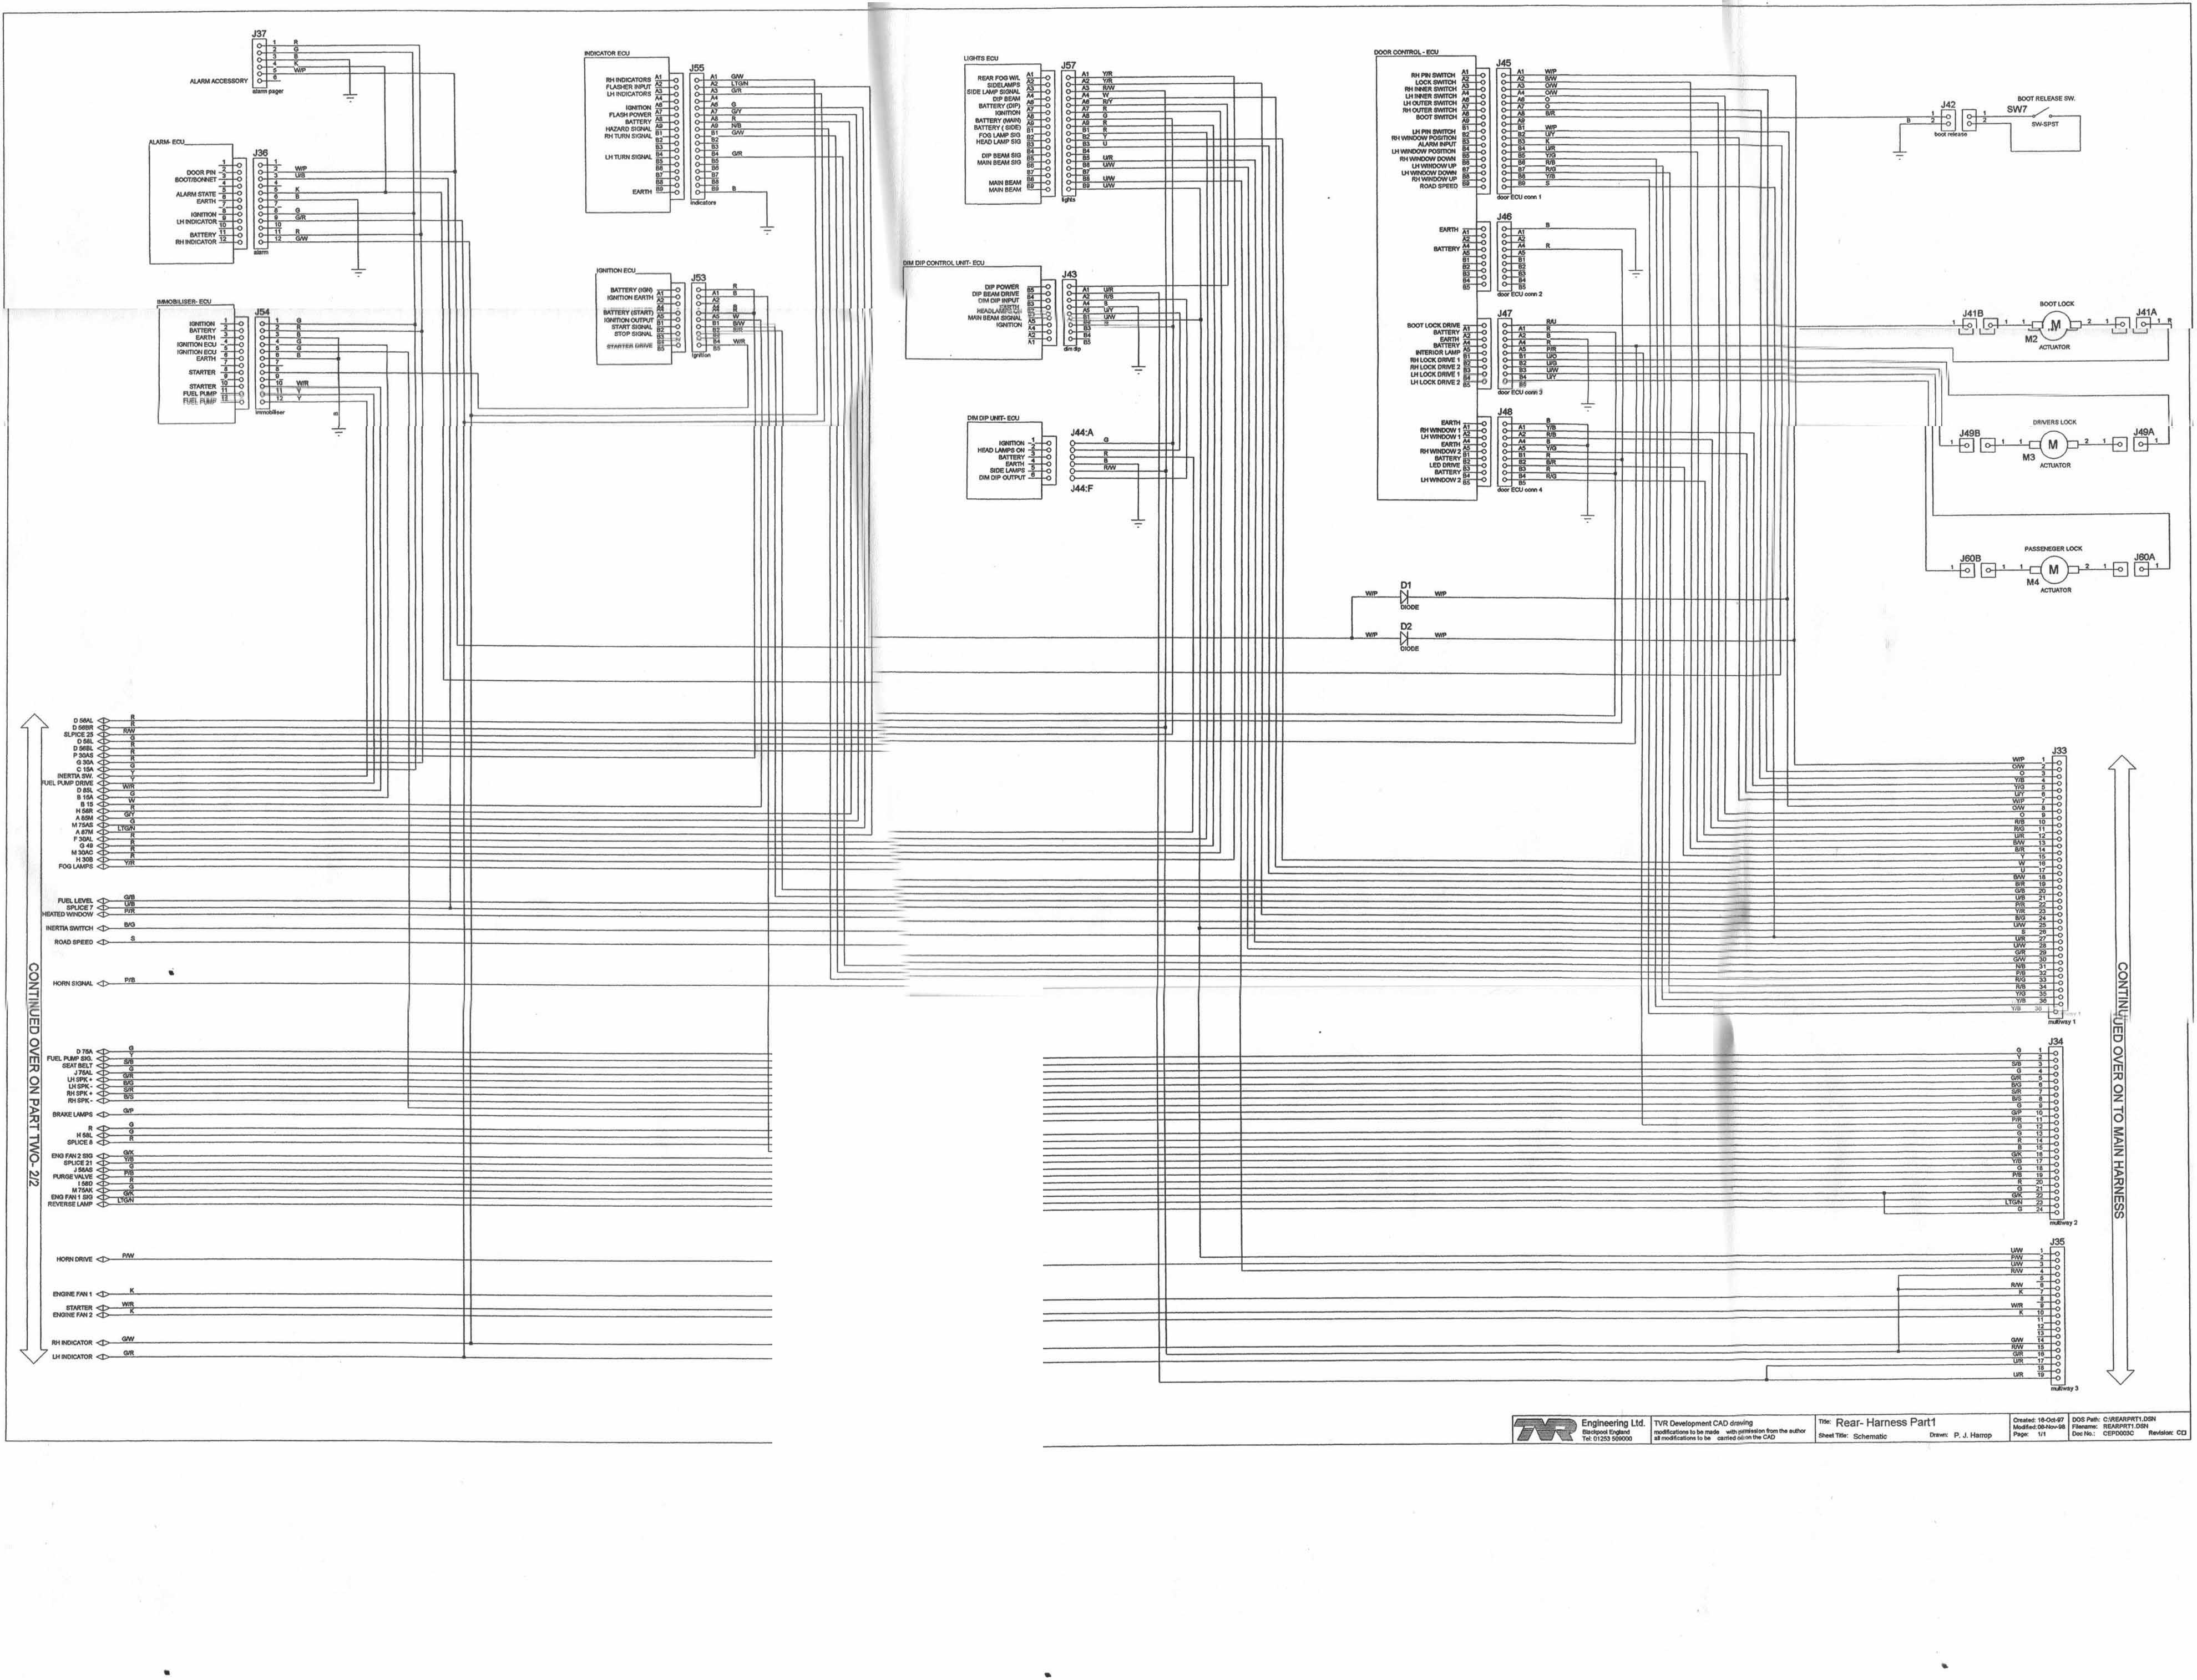 wiring diagrams. Black Bedroom Furniture Sets. Home Design Ideas